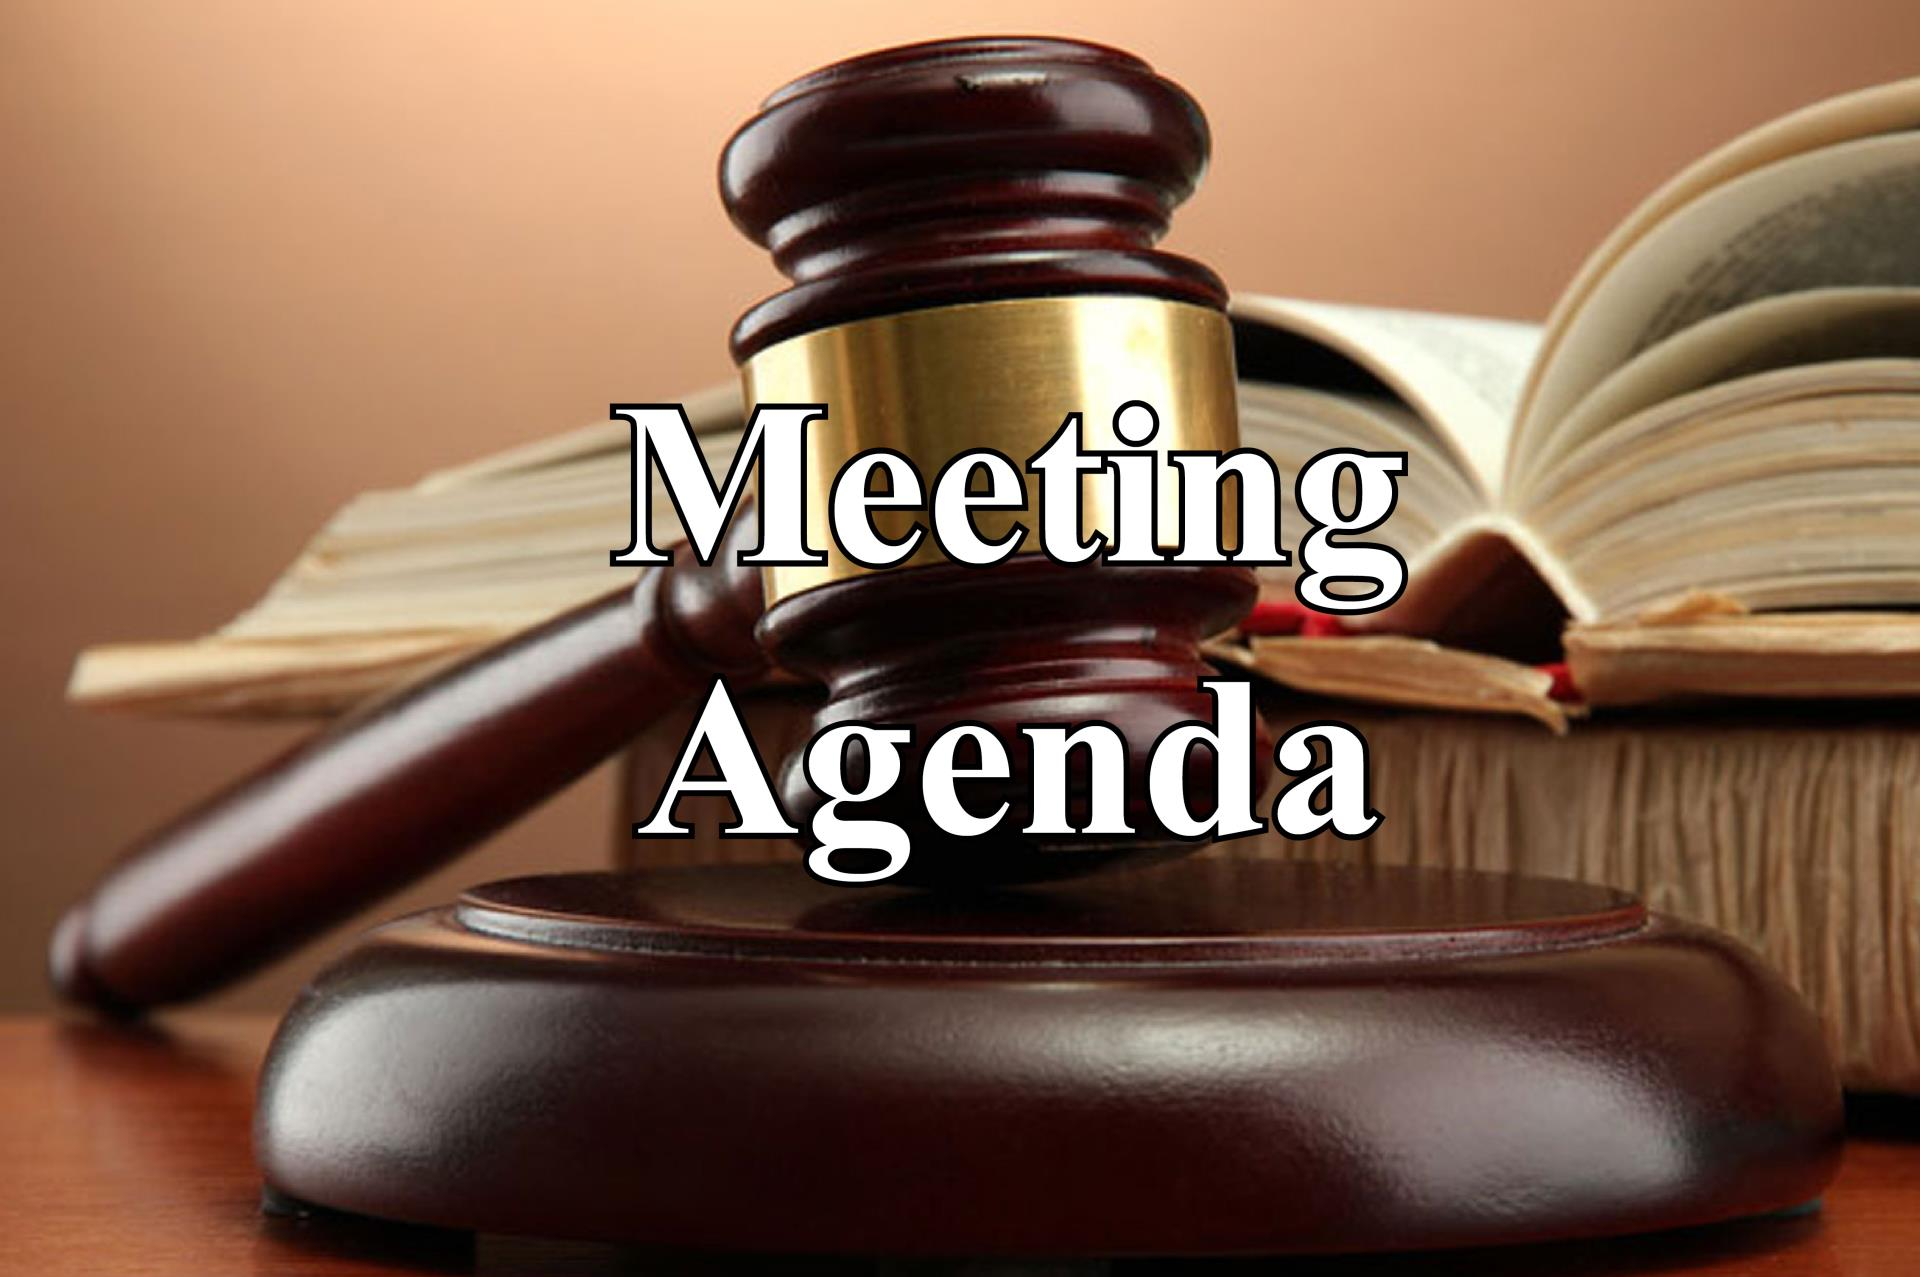 Meeting agenda icon